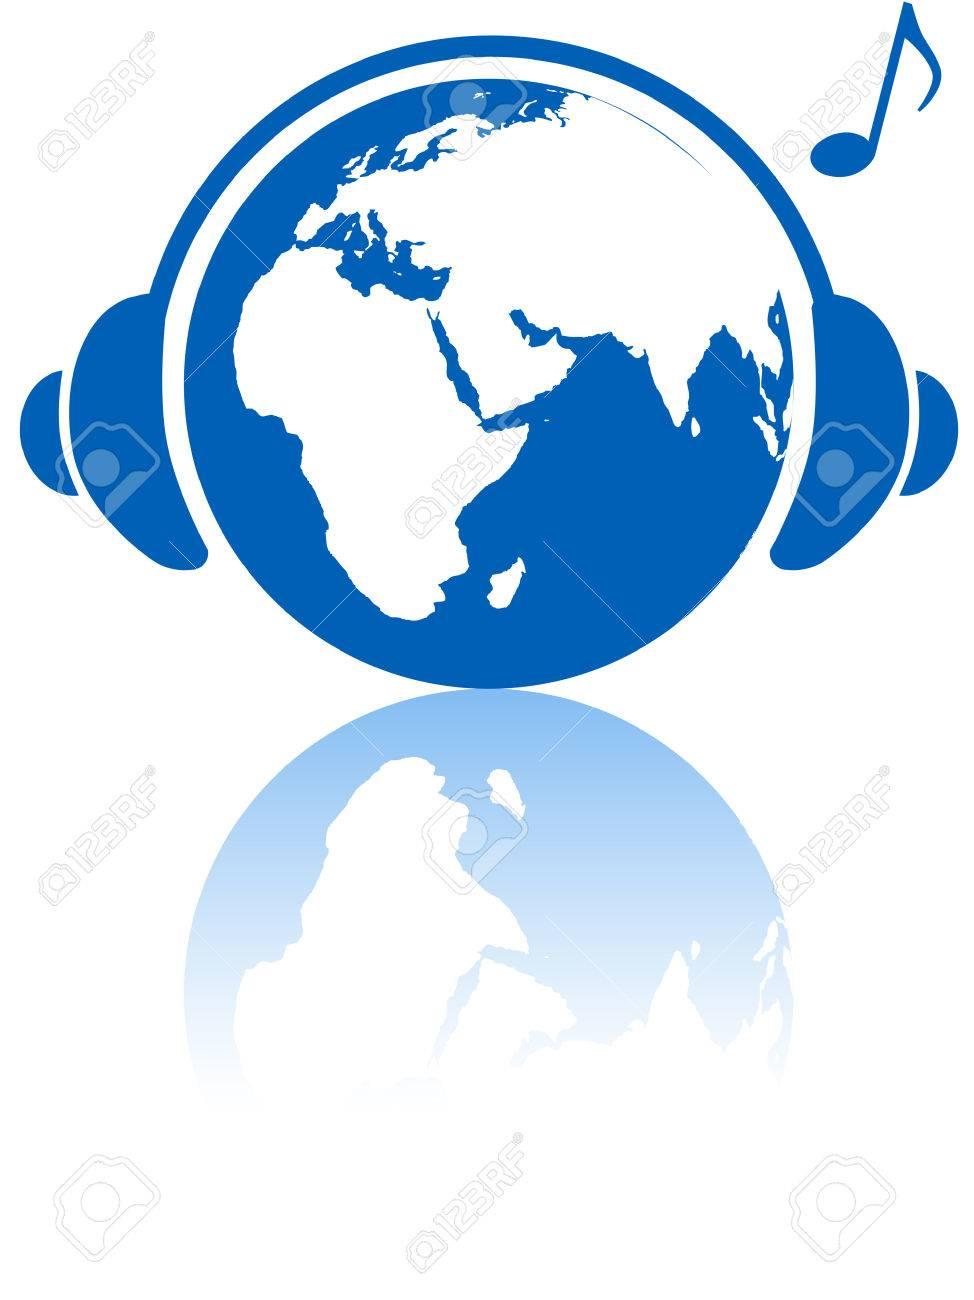 Eastern Hemisphere Globe The Eastern Hemisphere Wears